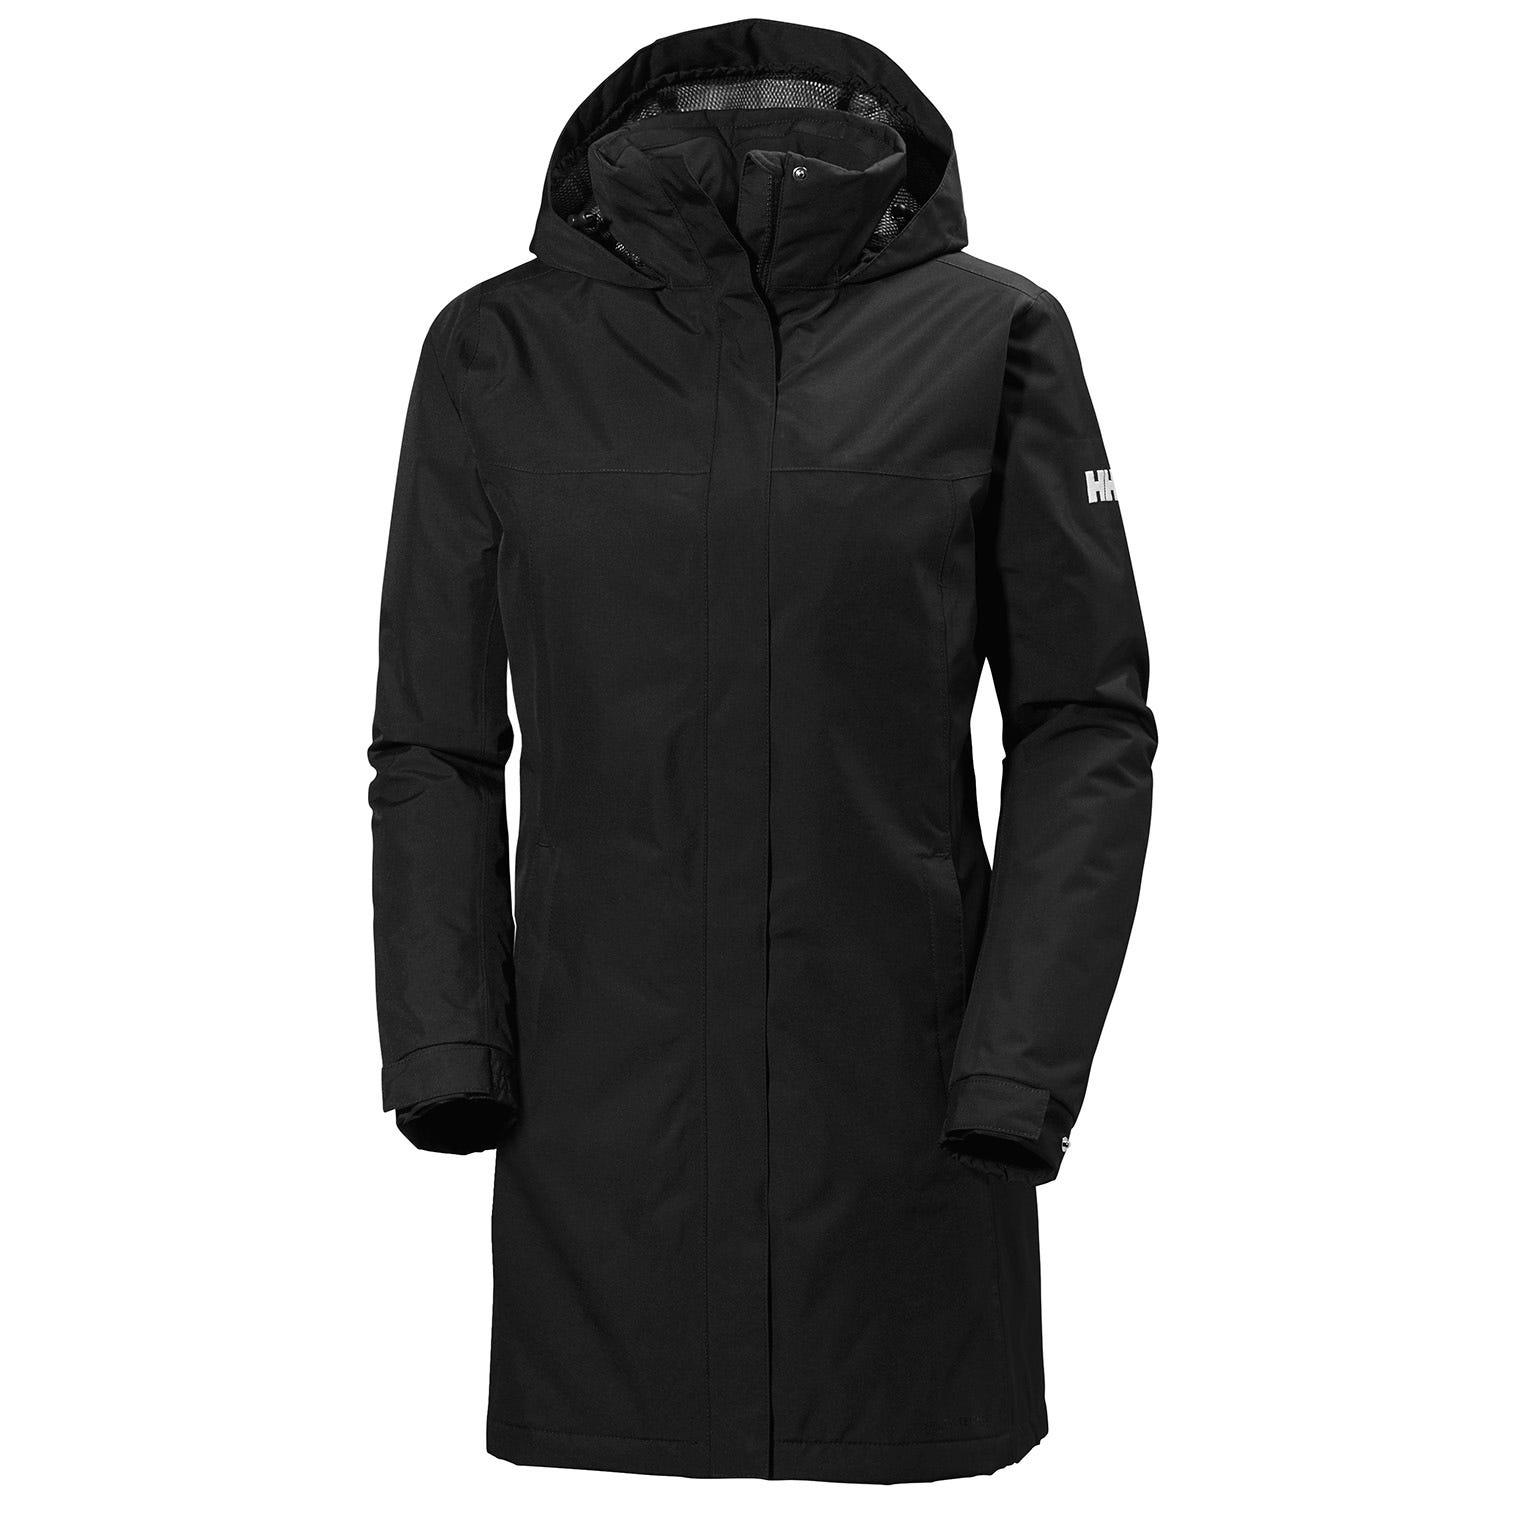 Womens Aden Long Insulated Rain Coat | Helly Hansen Womens Parka Black L